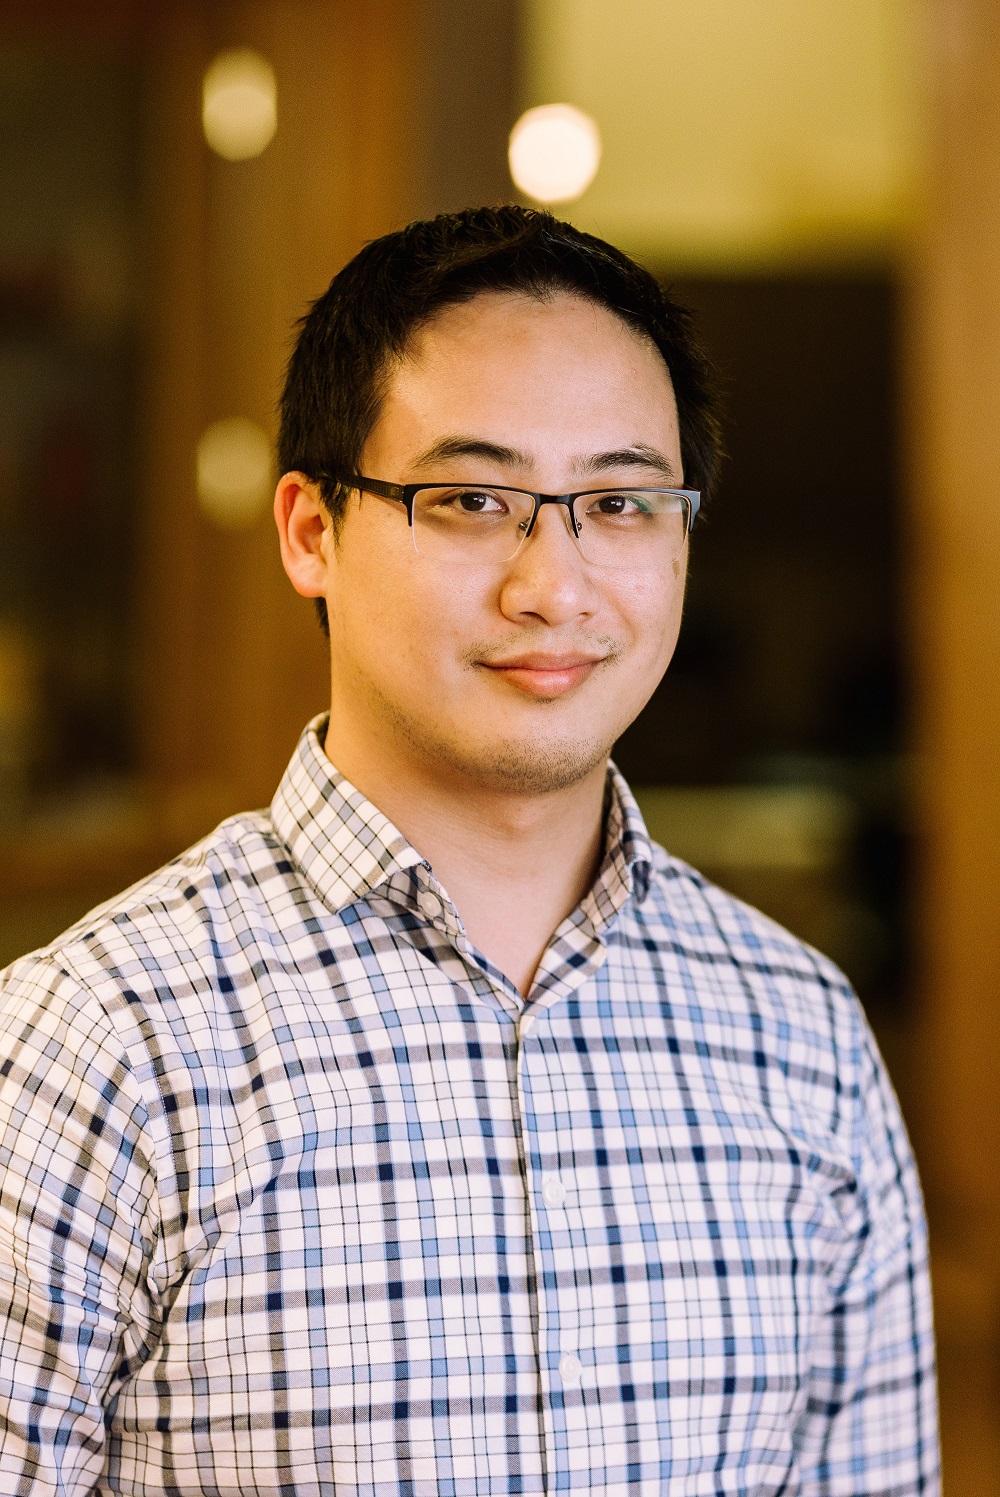 Charles Chin, Senior Associate Data Scientist, KPMG